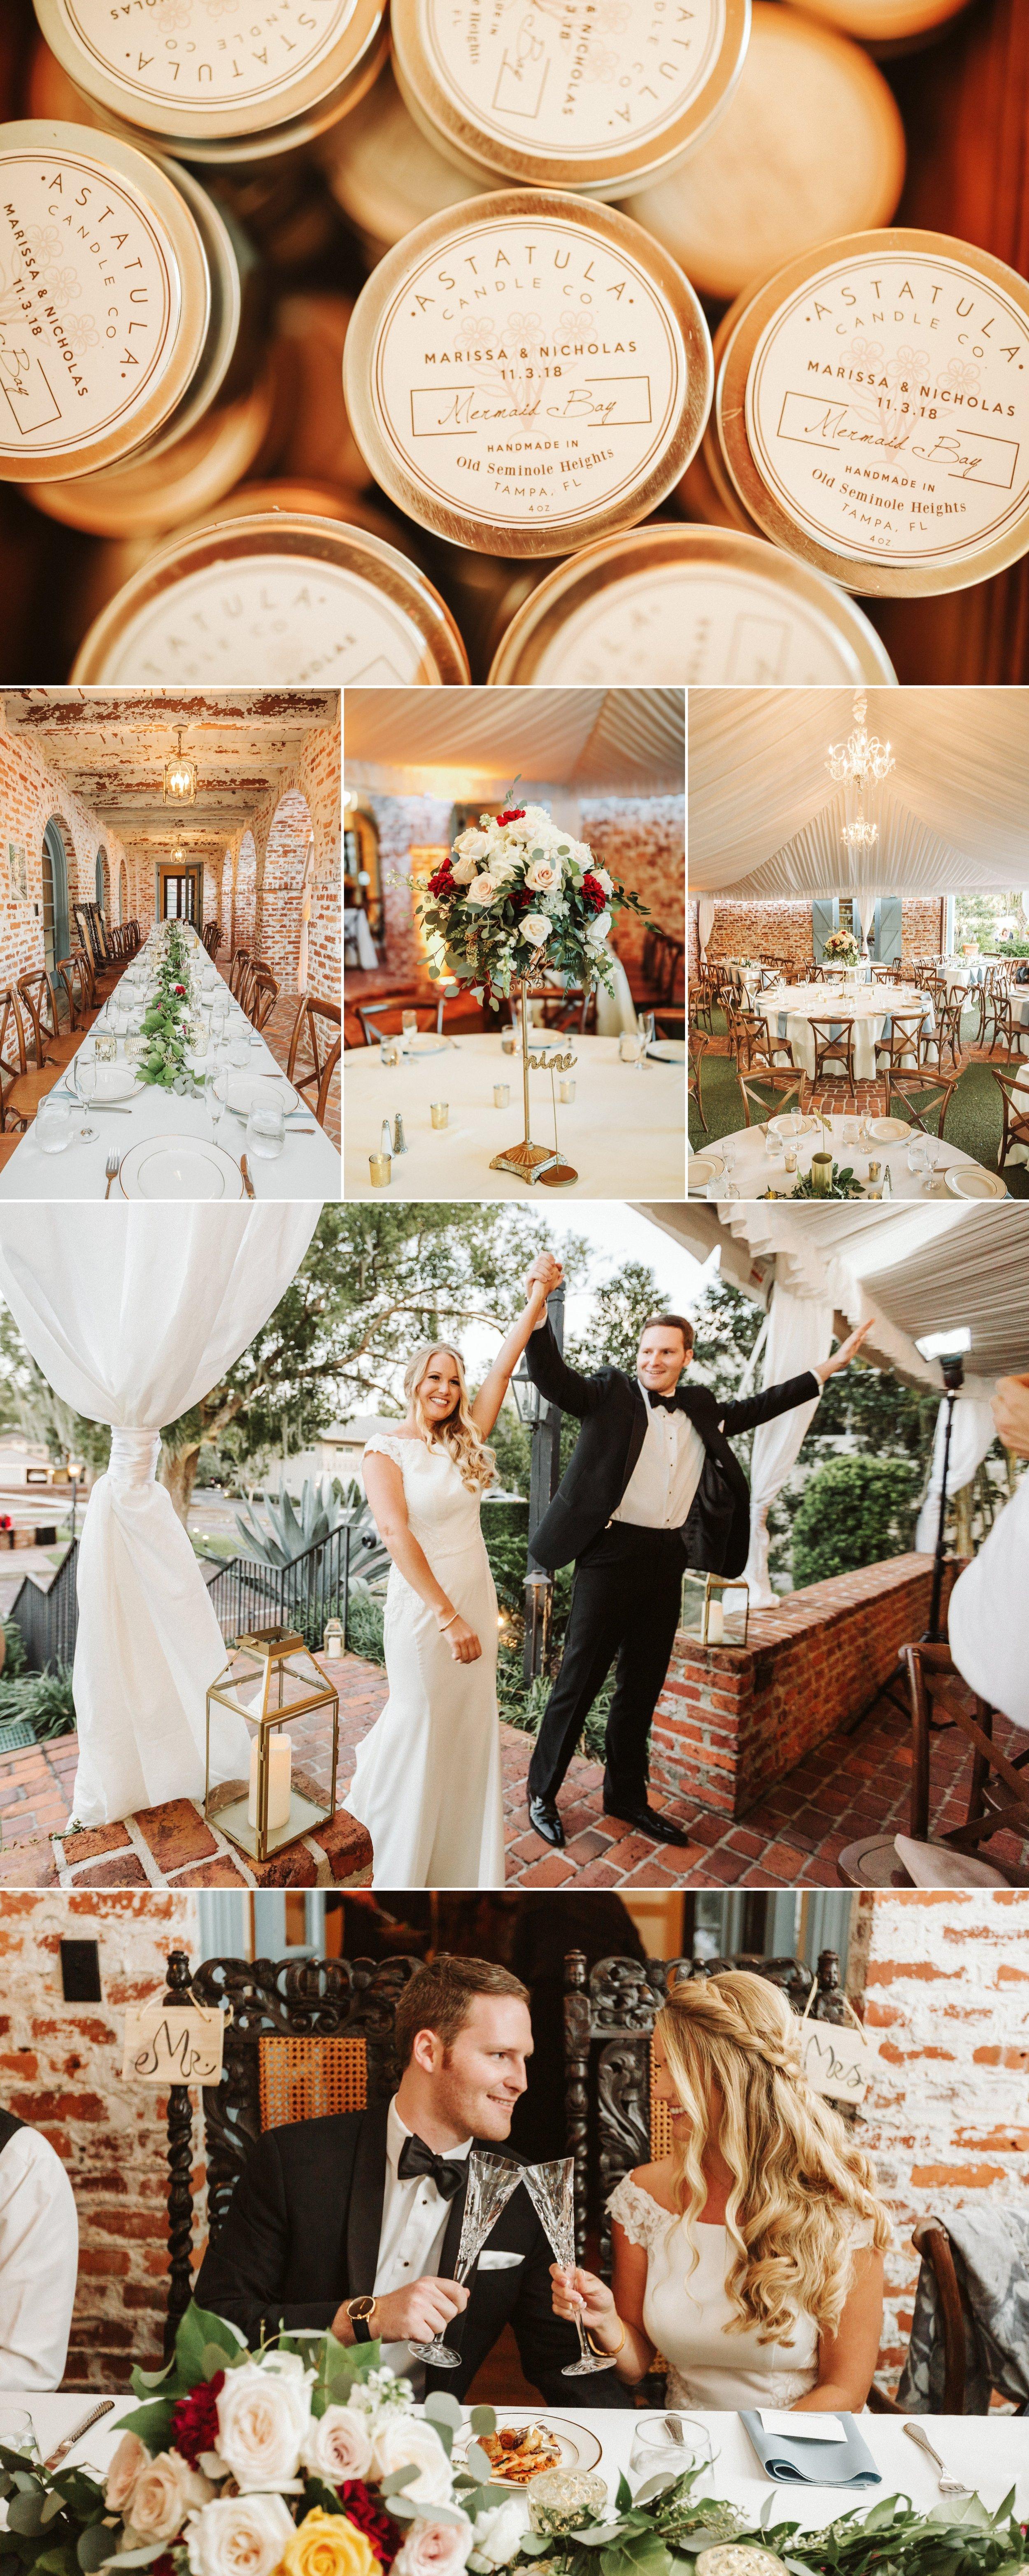 Casa Feliz Romantic Black Tie Wedding- Nick + Marissa- by Shaina DeCiryan Photography9.jpg